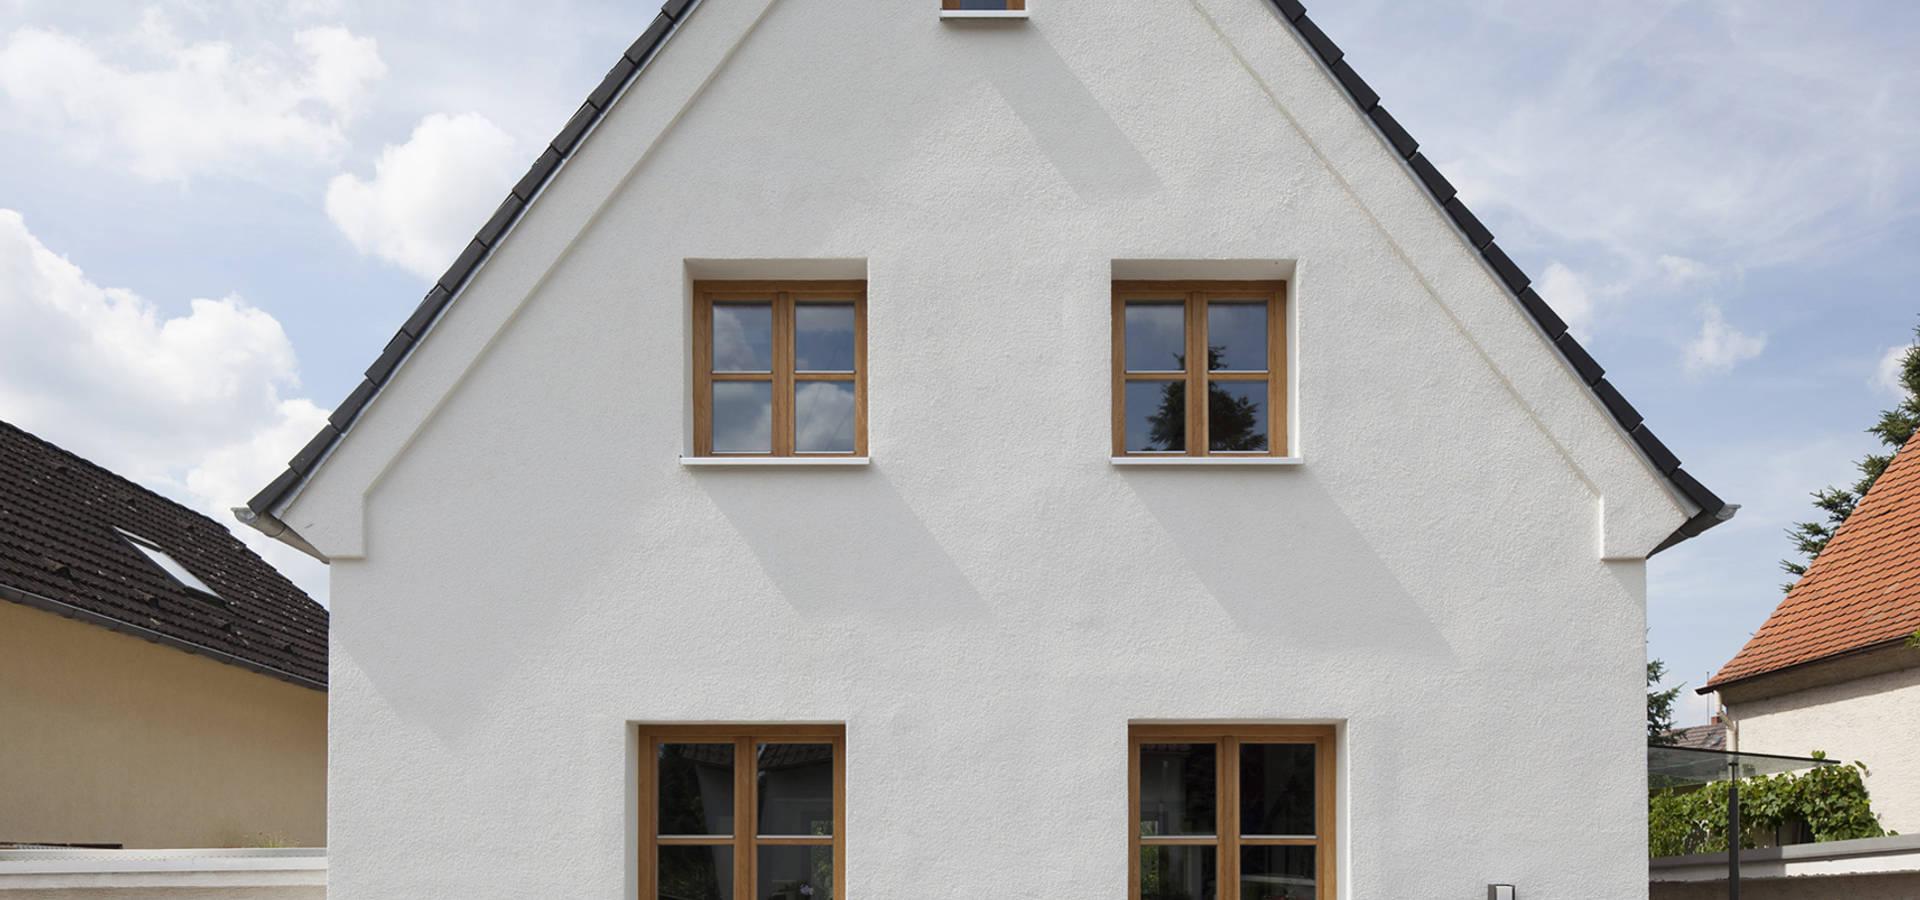 gerstner kaluza architektur gmbh architekten in frankfurt am main homify. Black Bedroom Furniture Sets. Home Design Ideas